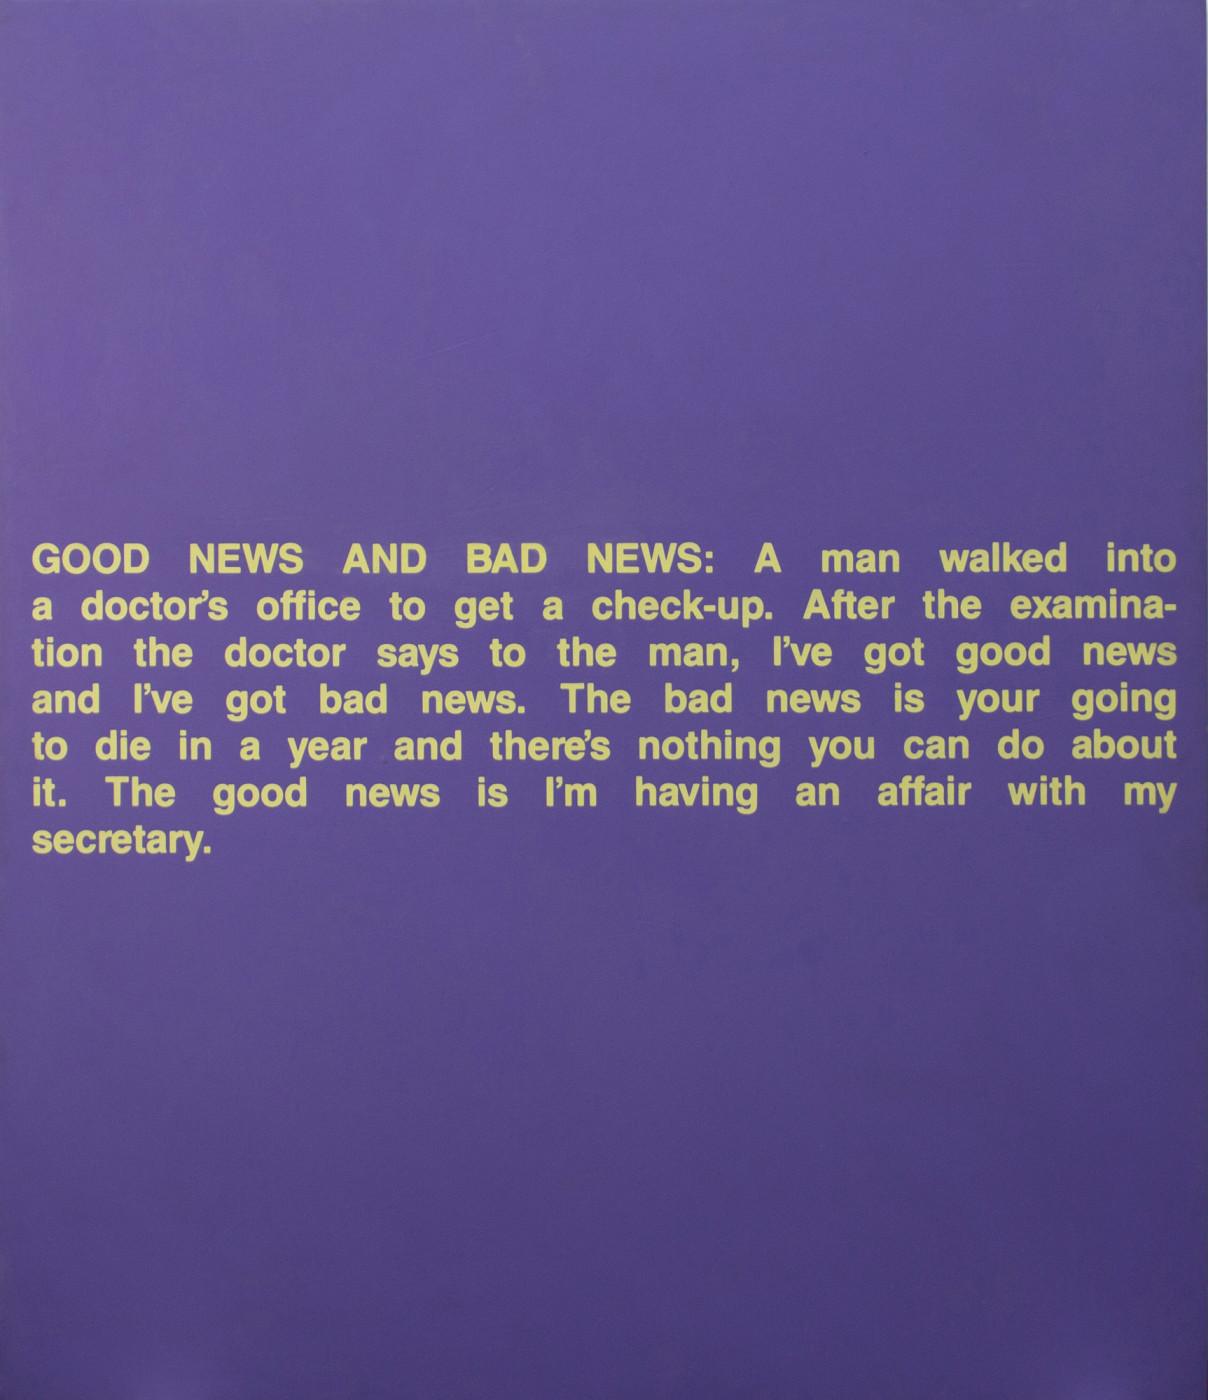 "<div class=""title""><em>Good News, Bad News</em>, 1988</div><div class=""medium"">acrylic and silkscreen on canvas</div><div class=""dimensions"">142.24 x 121.92 cm<br />56 x 48 in.</div>"